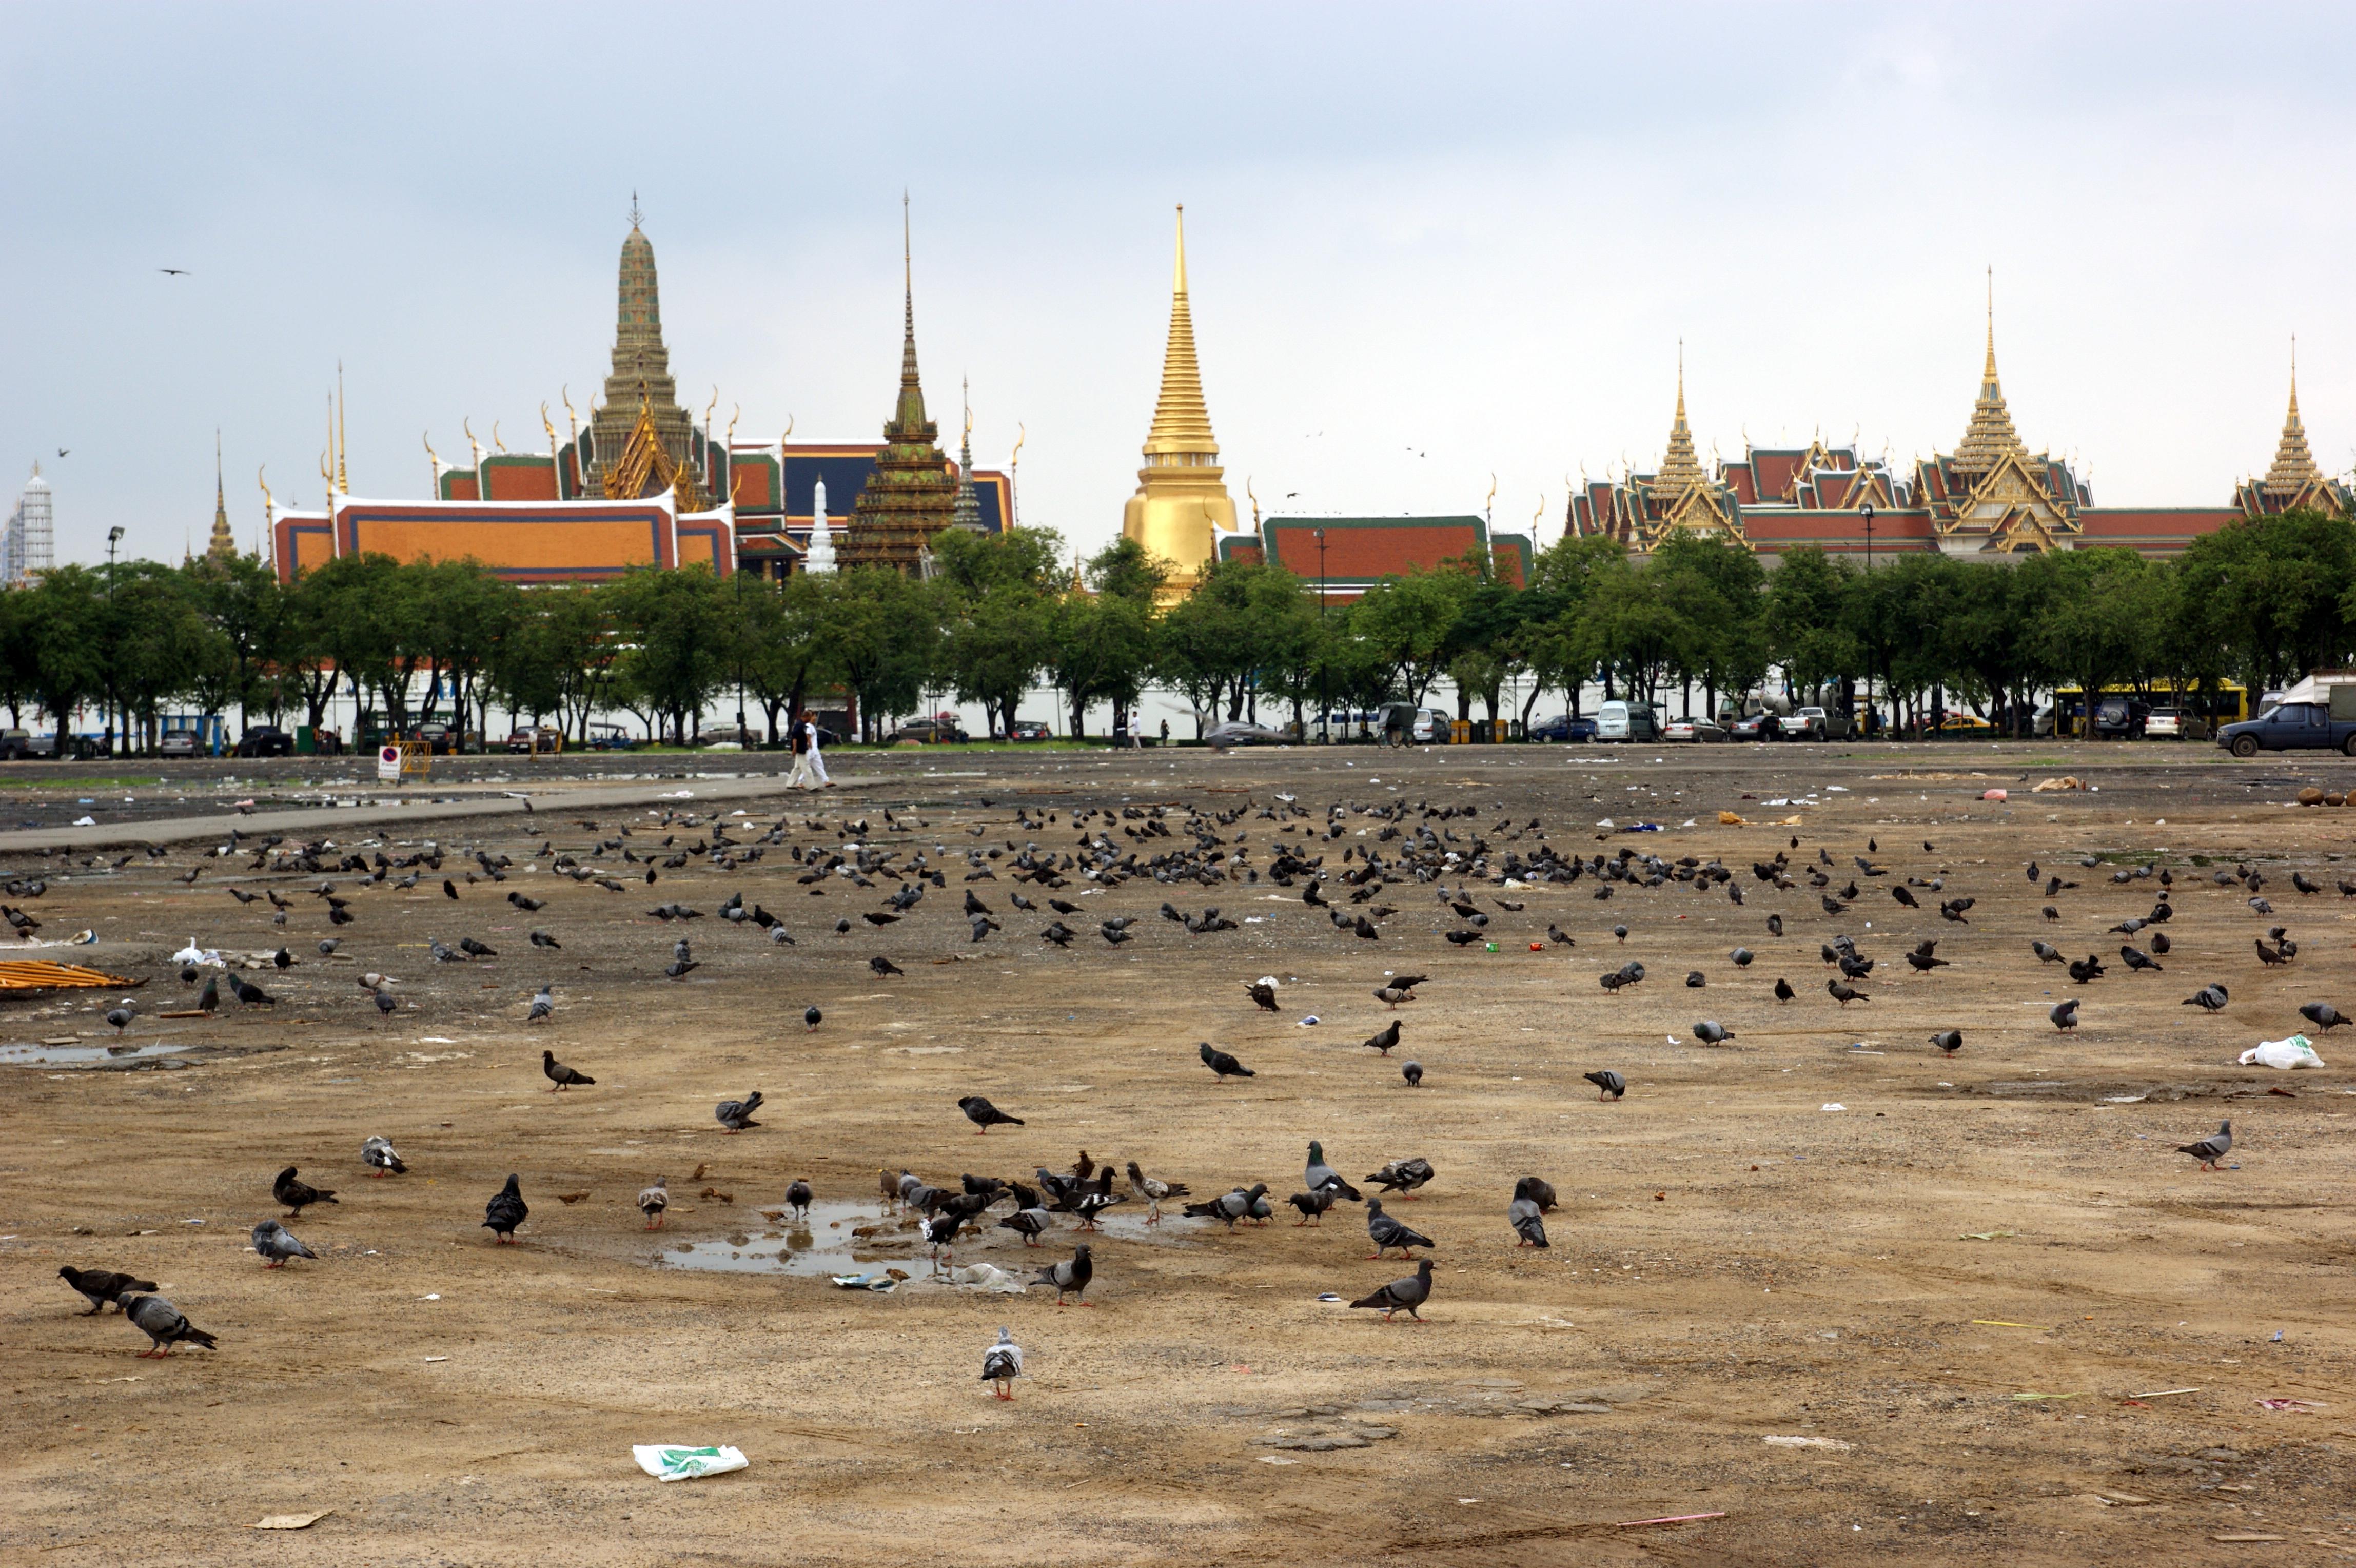 File:Sanam Luang by Allie Caulfield.jpg